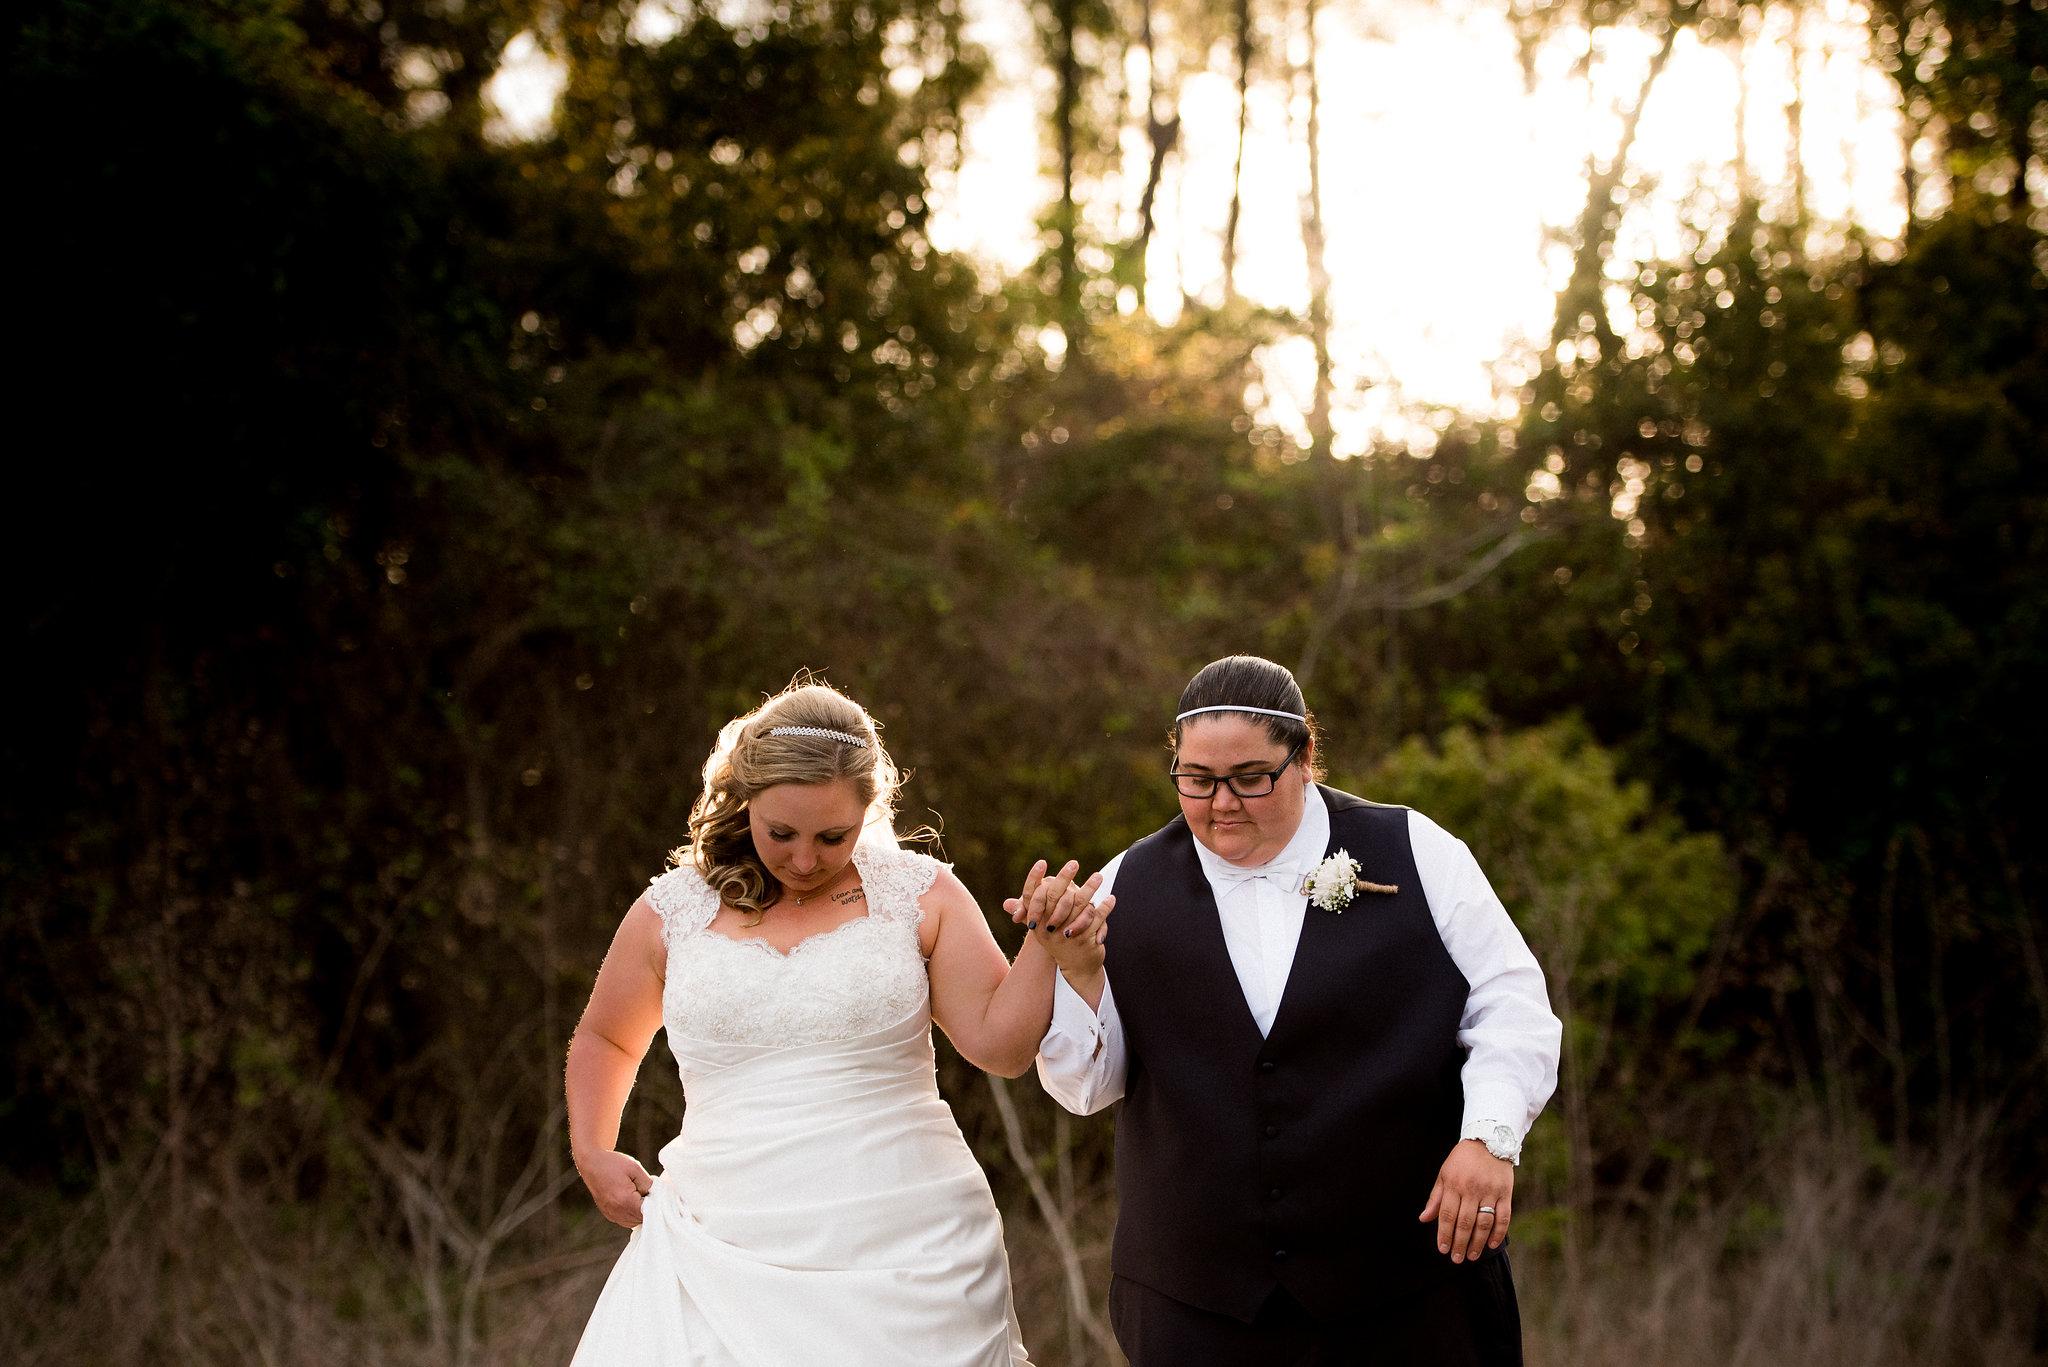 st-augustine-wedding-photographer-sarah-annay-photography.jpg26.jpg